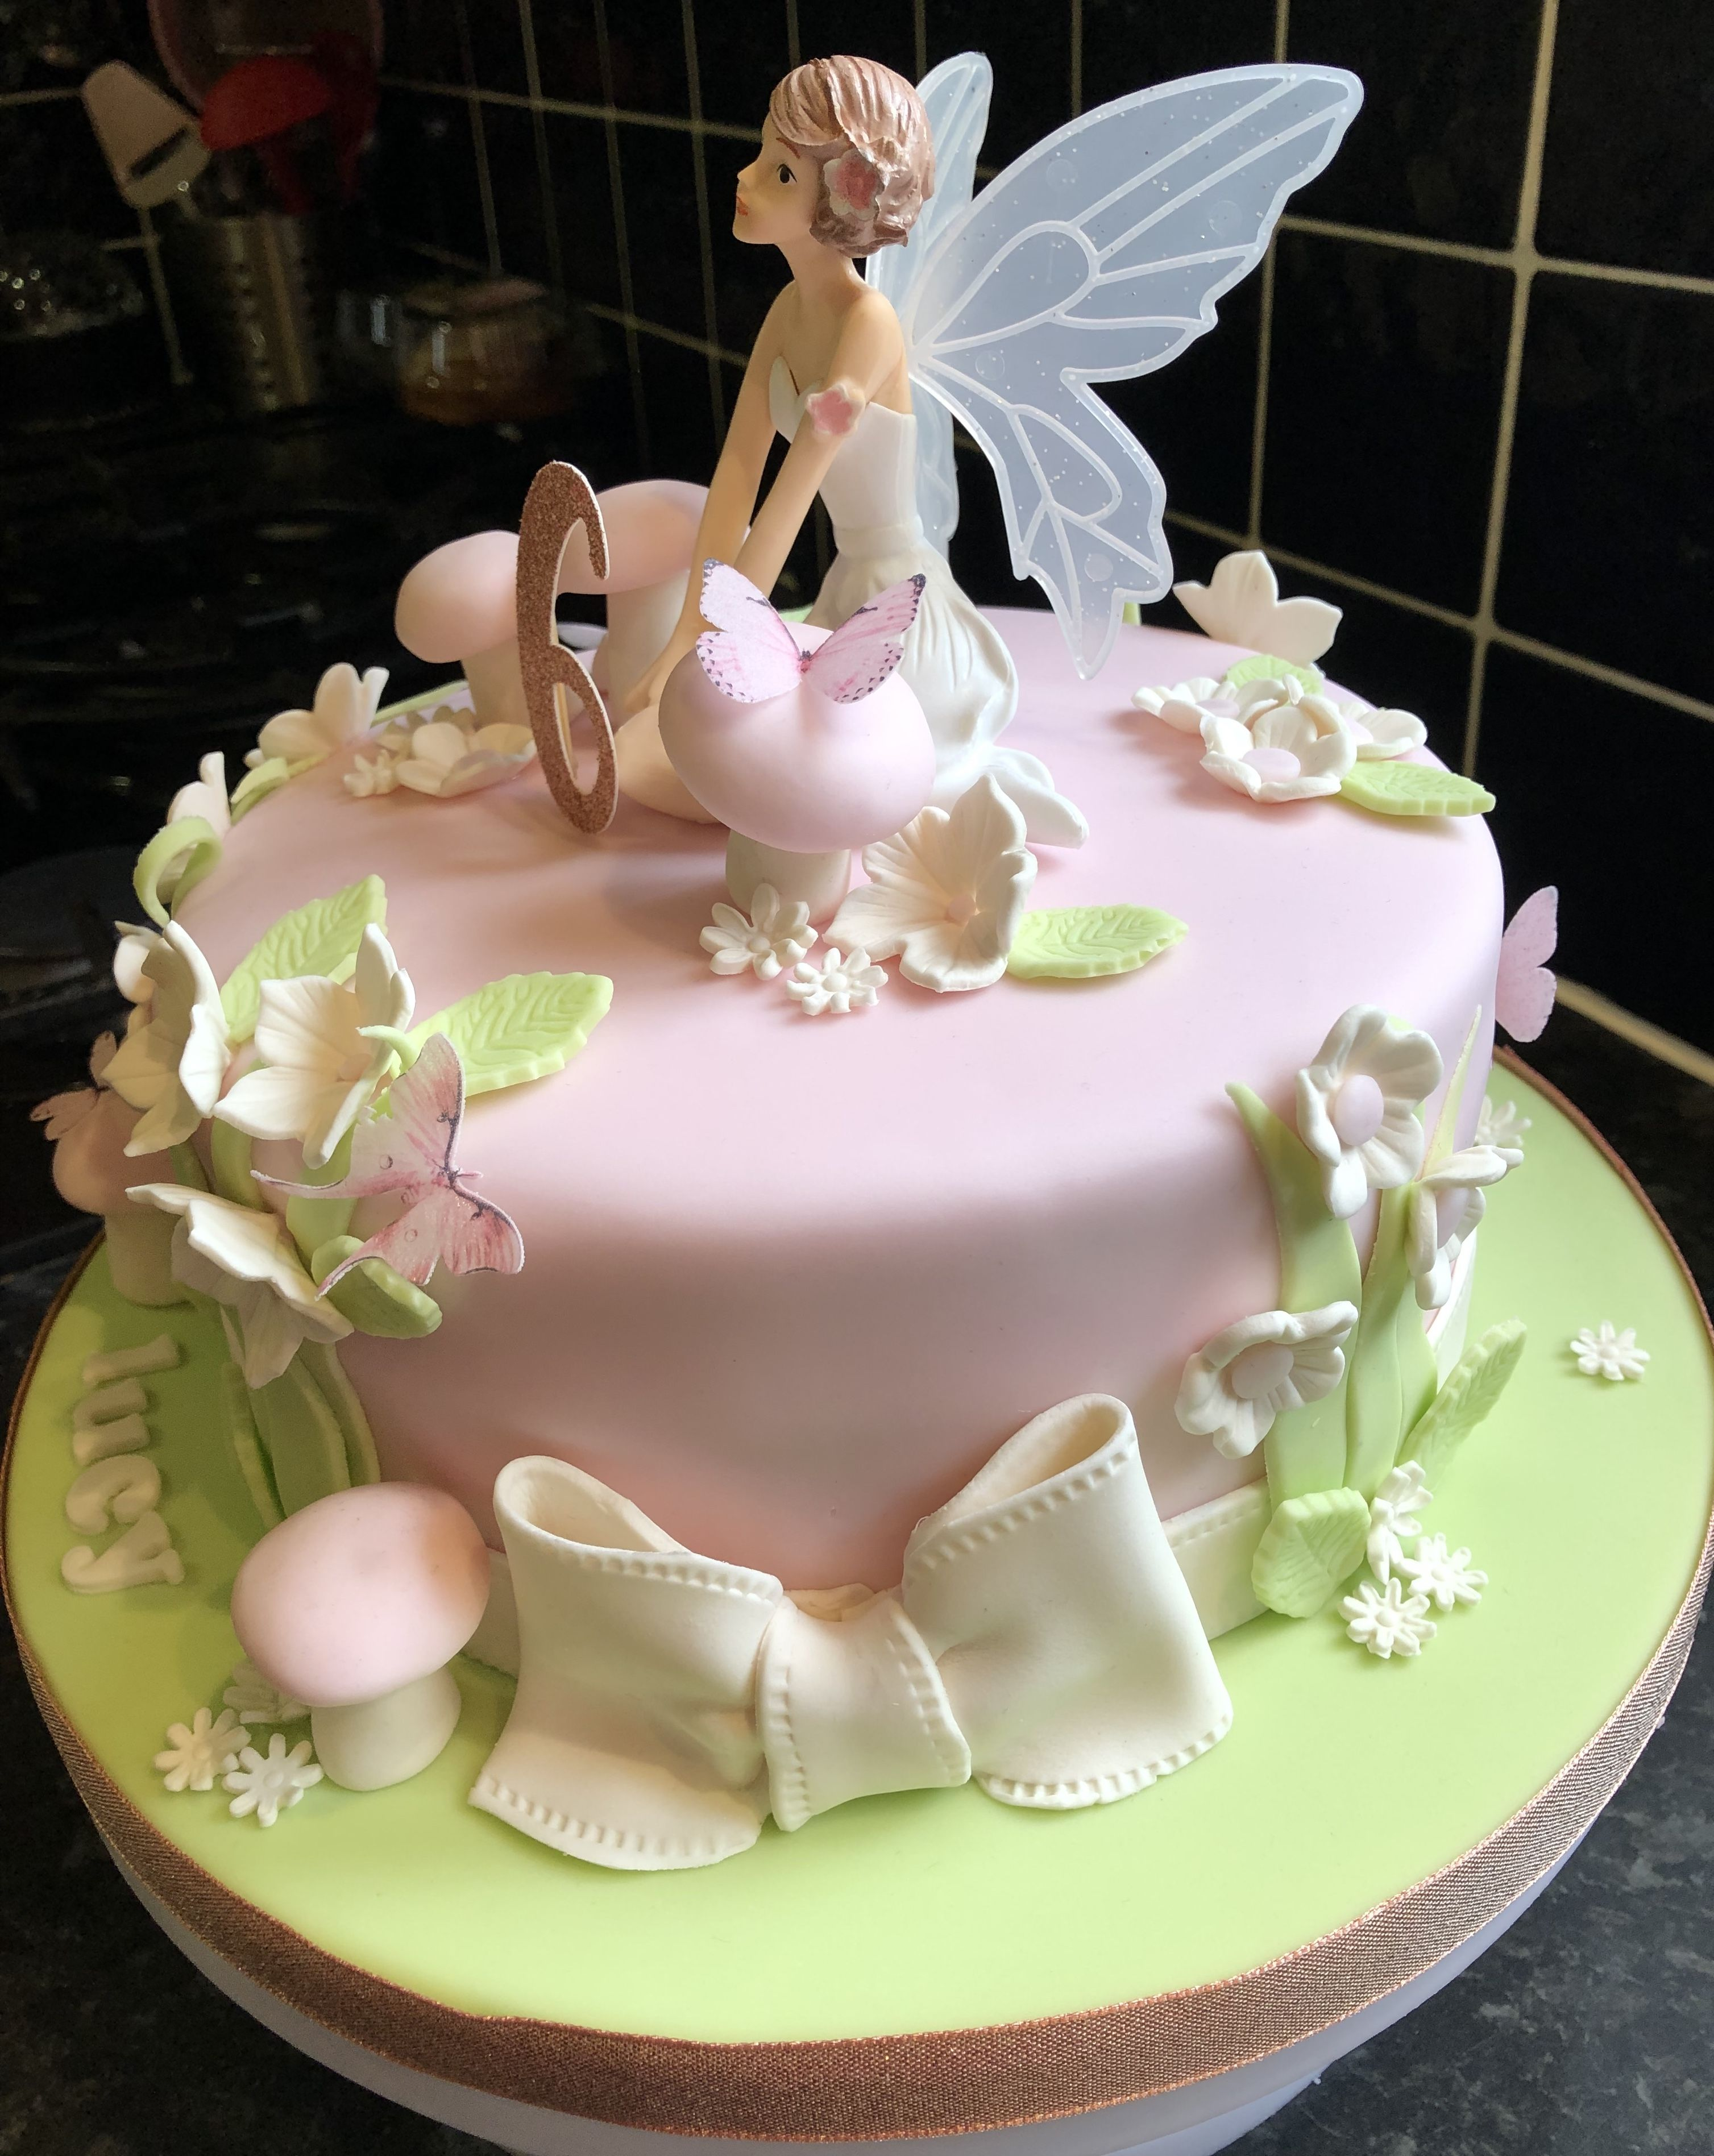 Fantastic Fairy Birthday Cake Fairy Birthday Cake Fairy Cakes Fairy Funny Birthday Cards Online Inifodamsfinfo